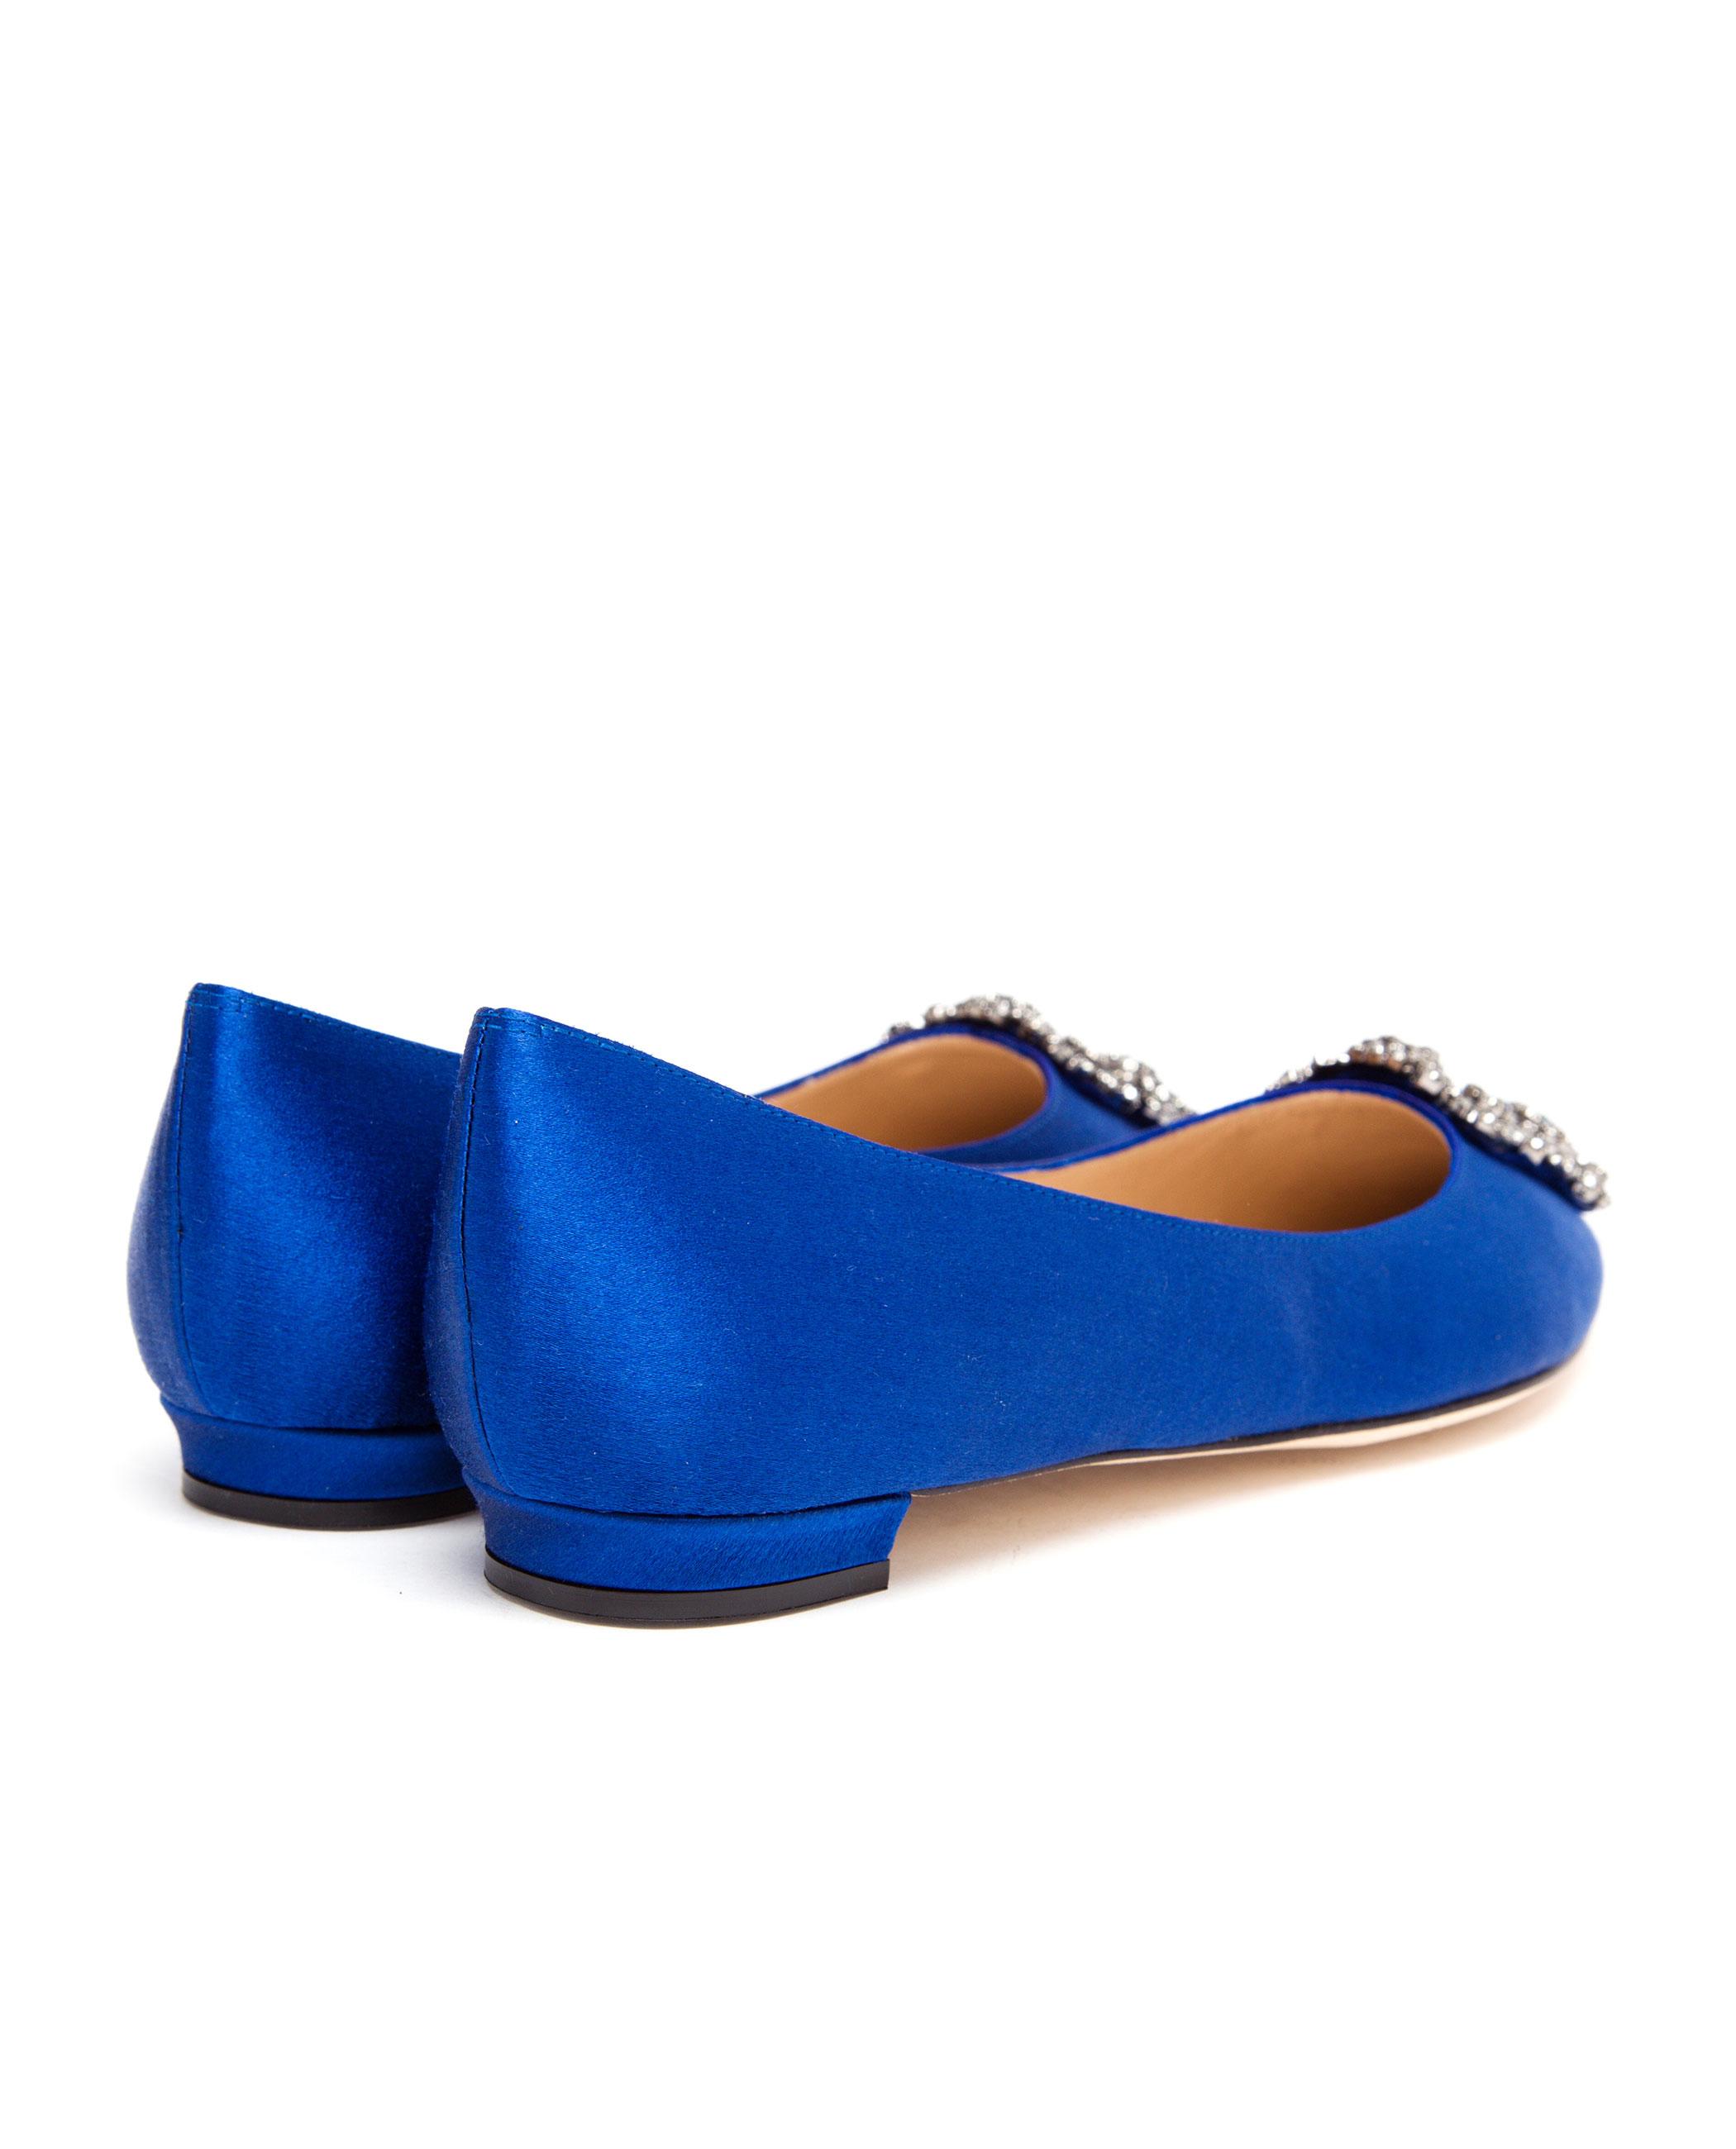 Lyst Manolo Blahnik Hangisi Embellished Satin Flats In Blue